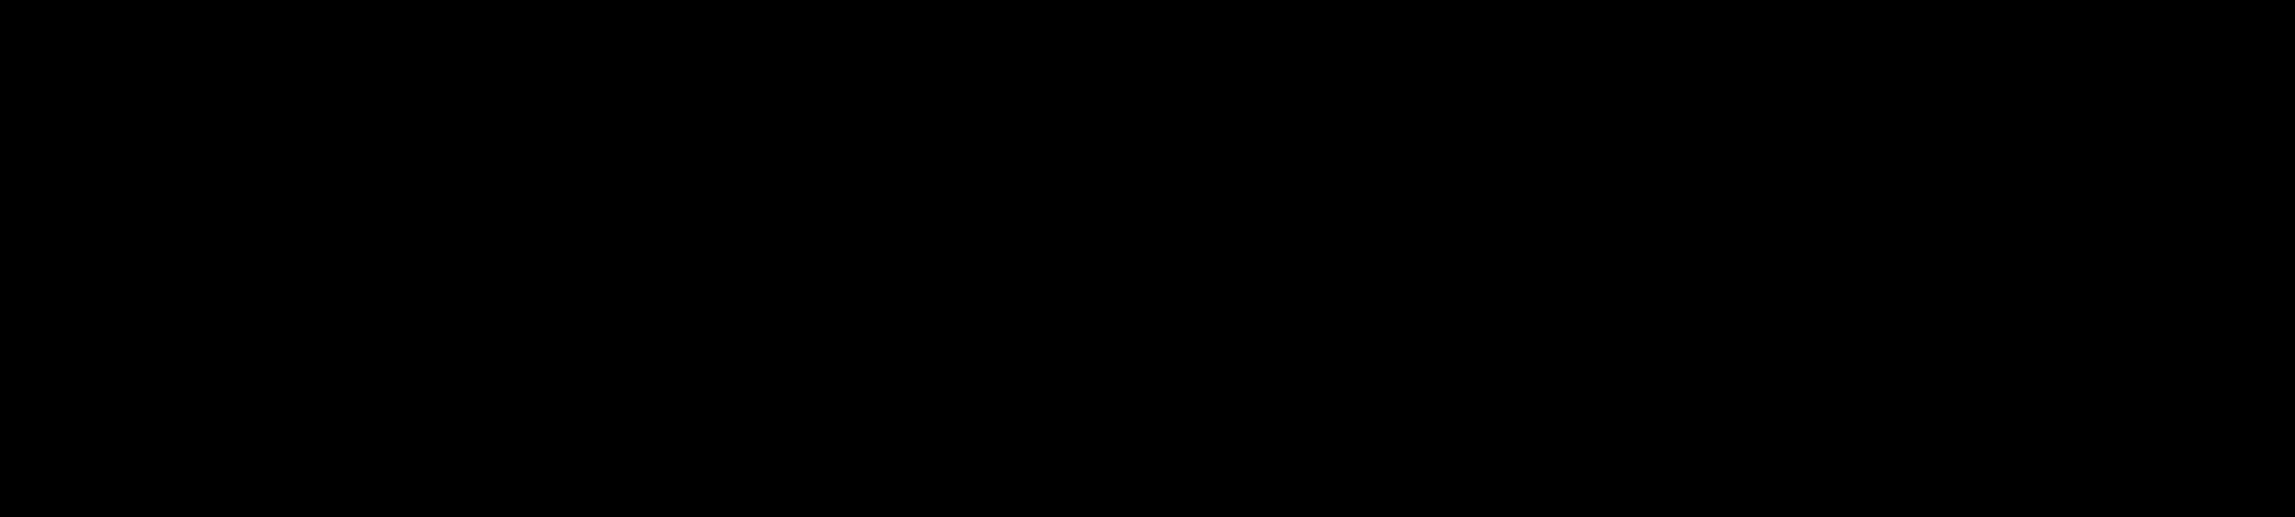 LKW-Handel G. Stietzel GmbH & Co. KG